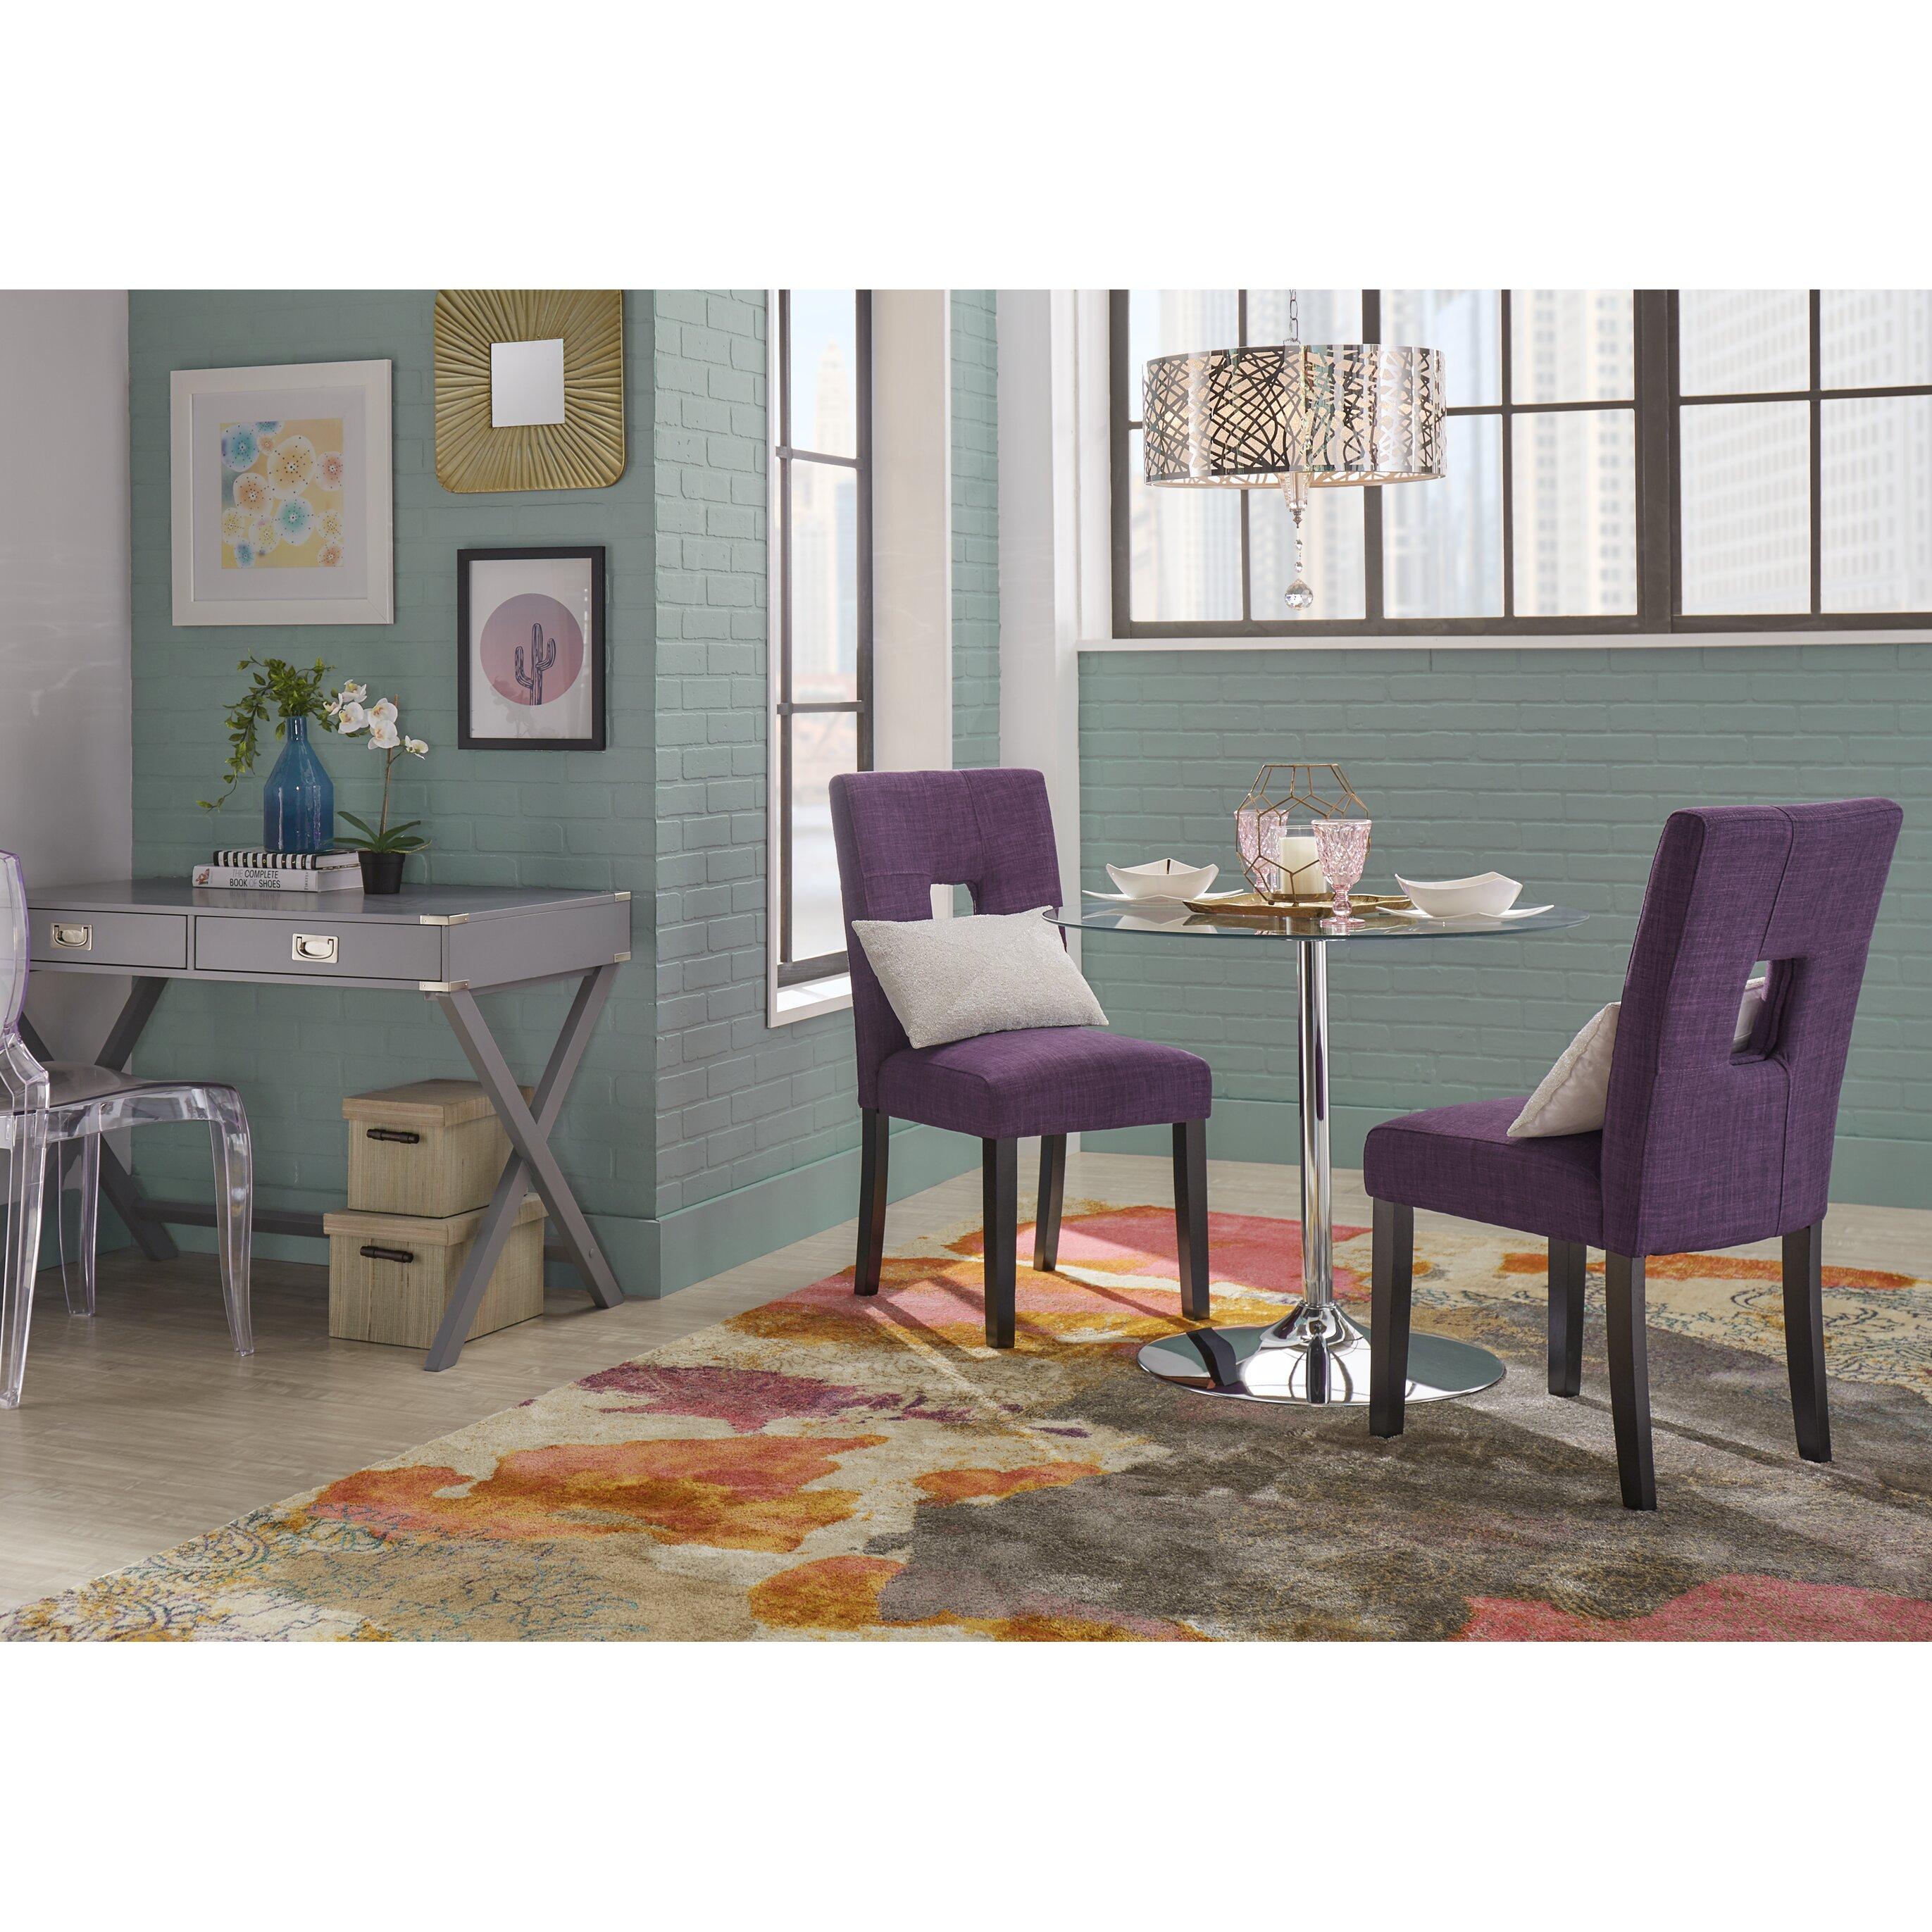 Argos Dining Room Tables Grstechus